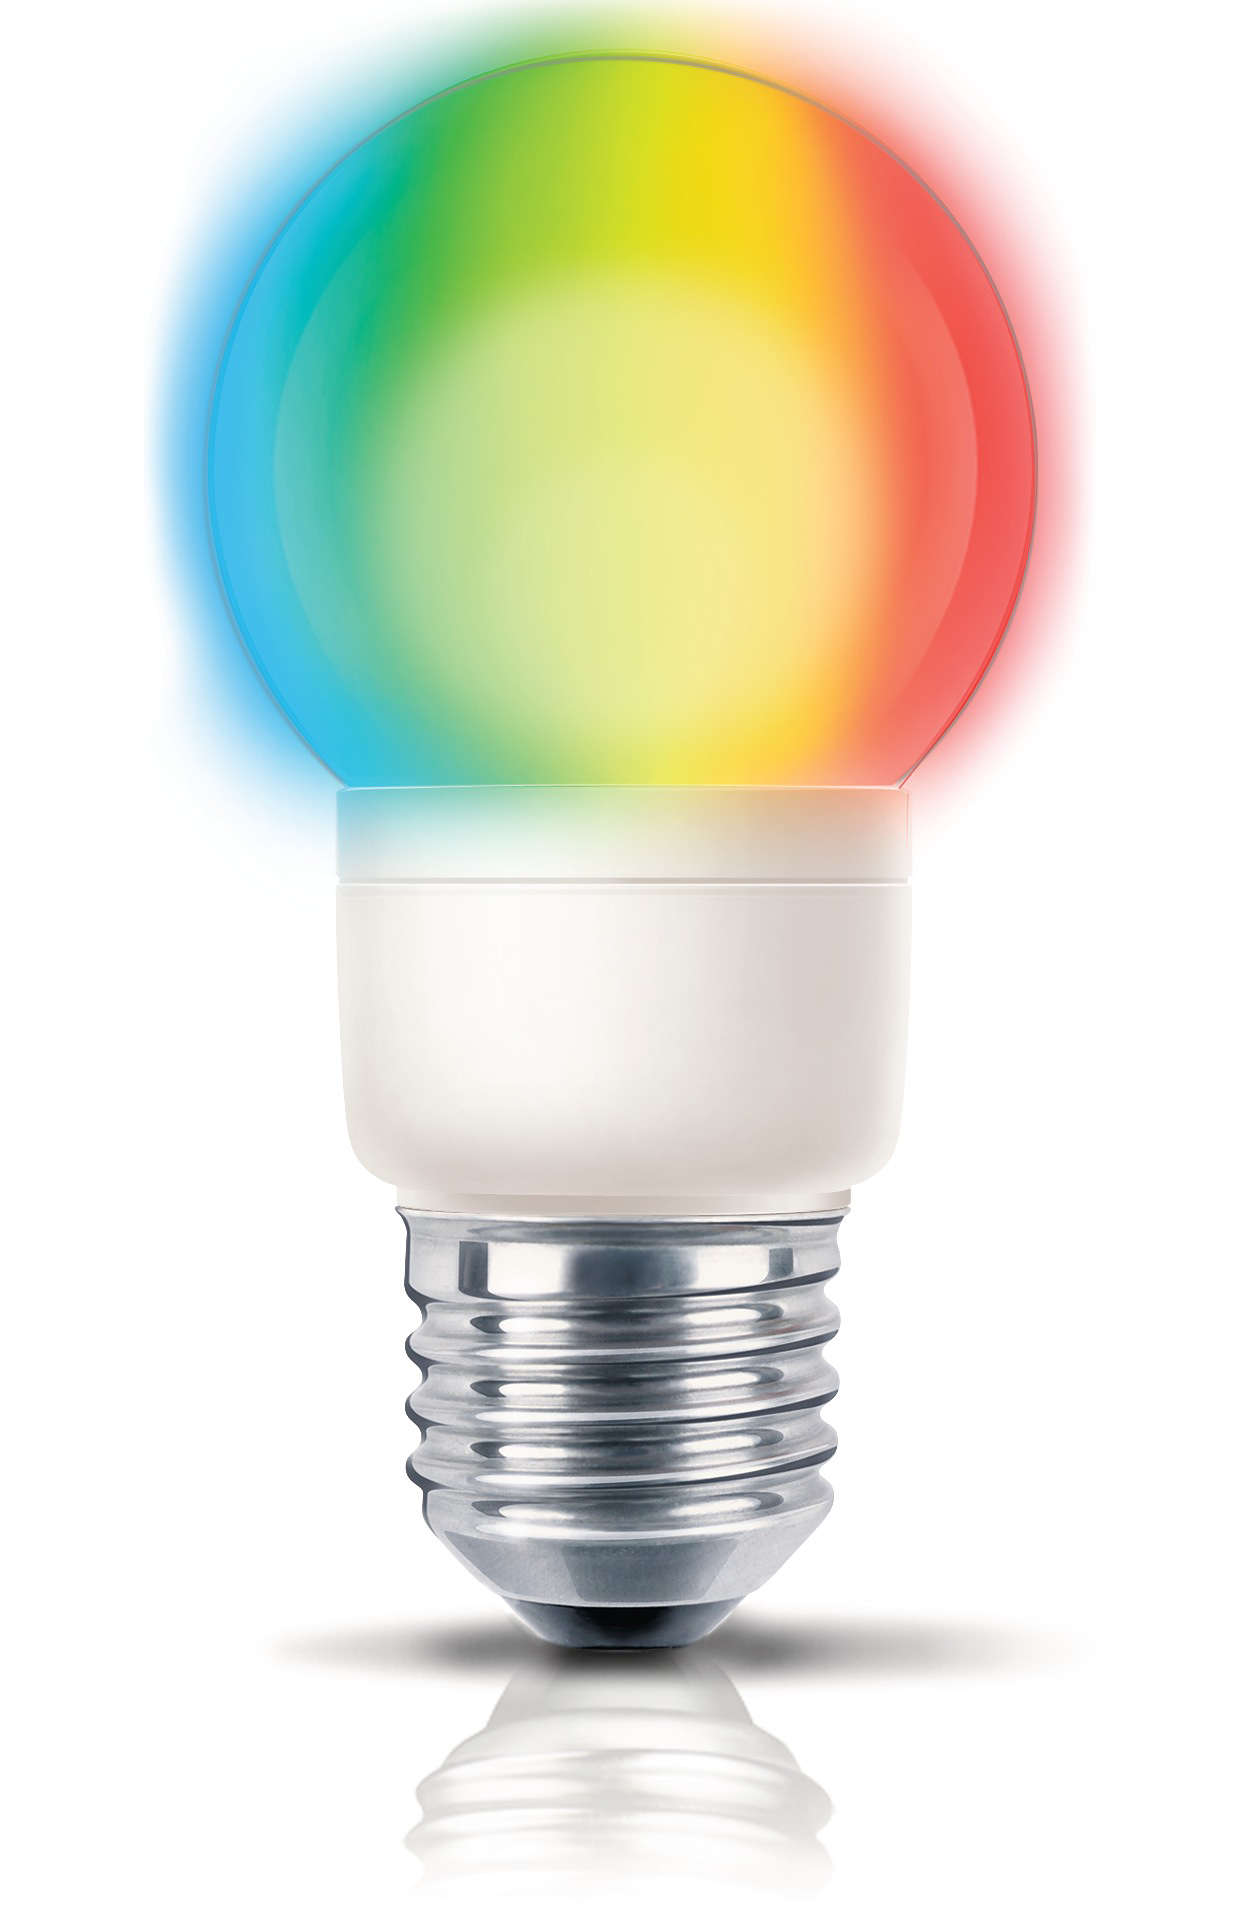 Luce colorata